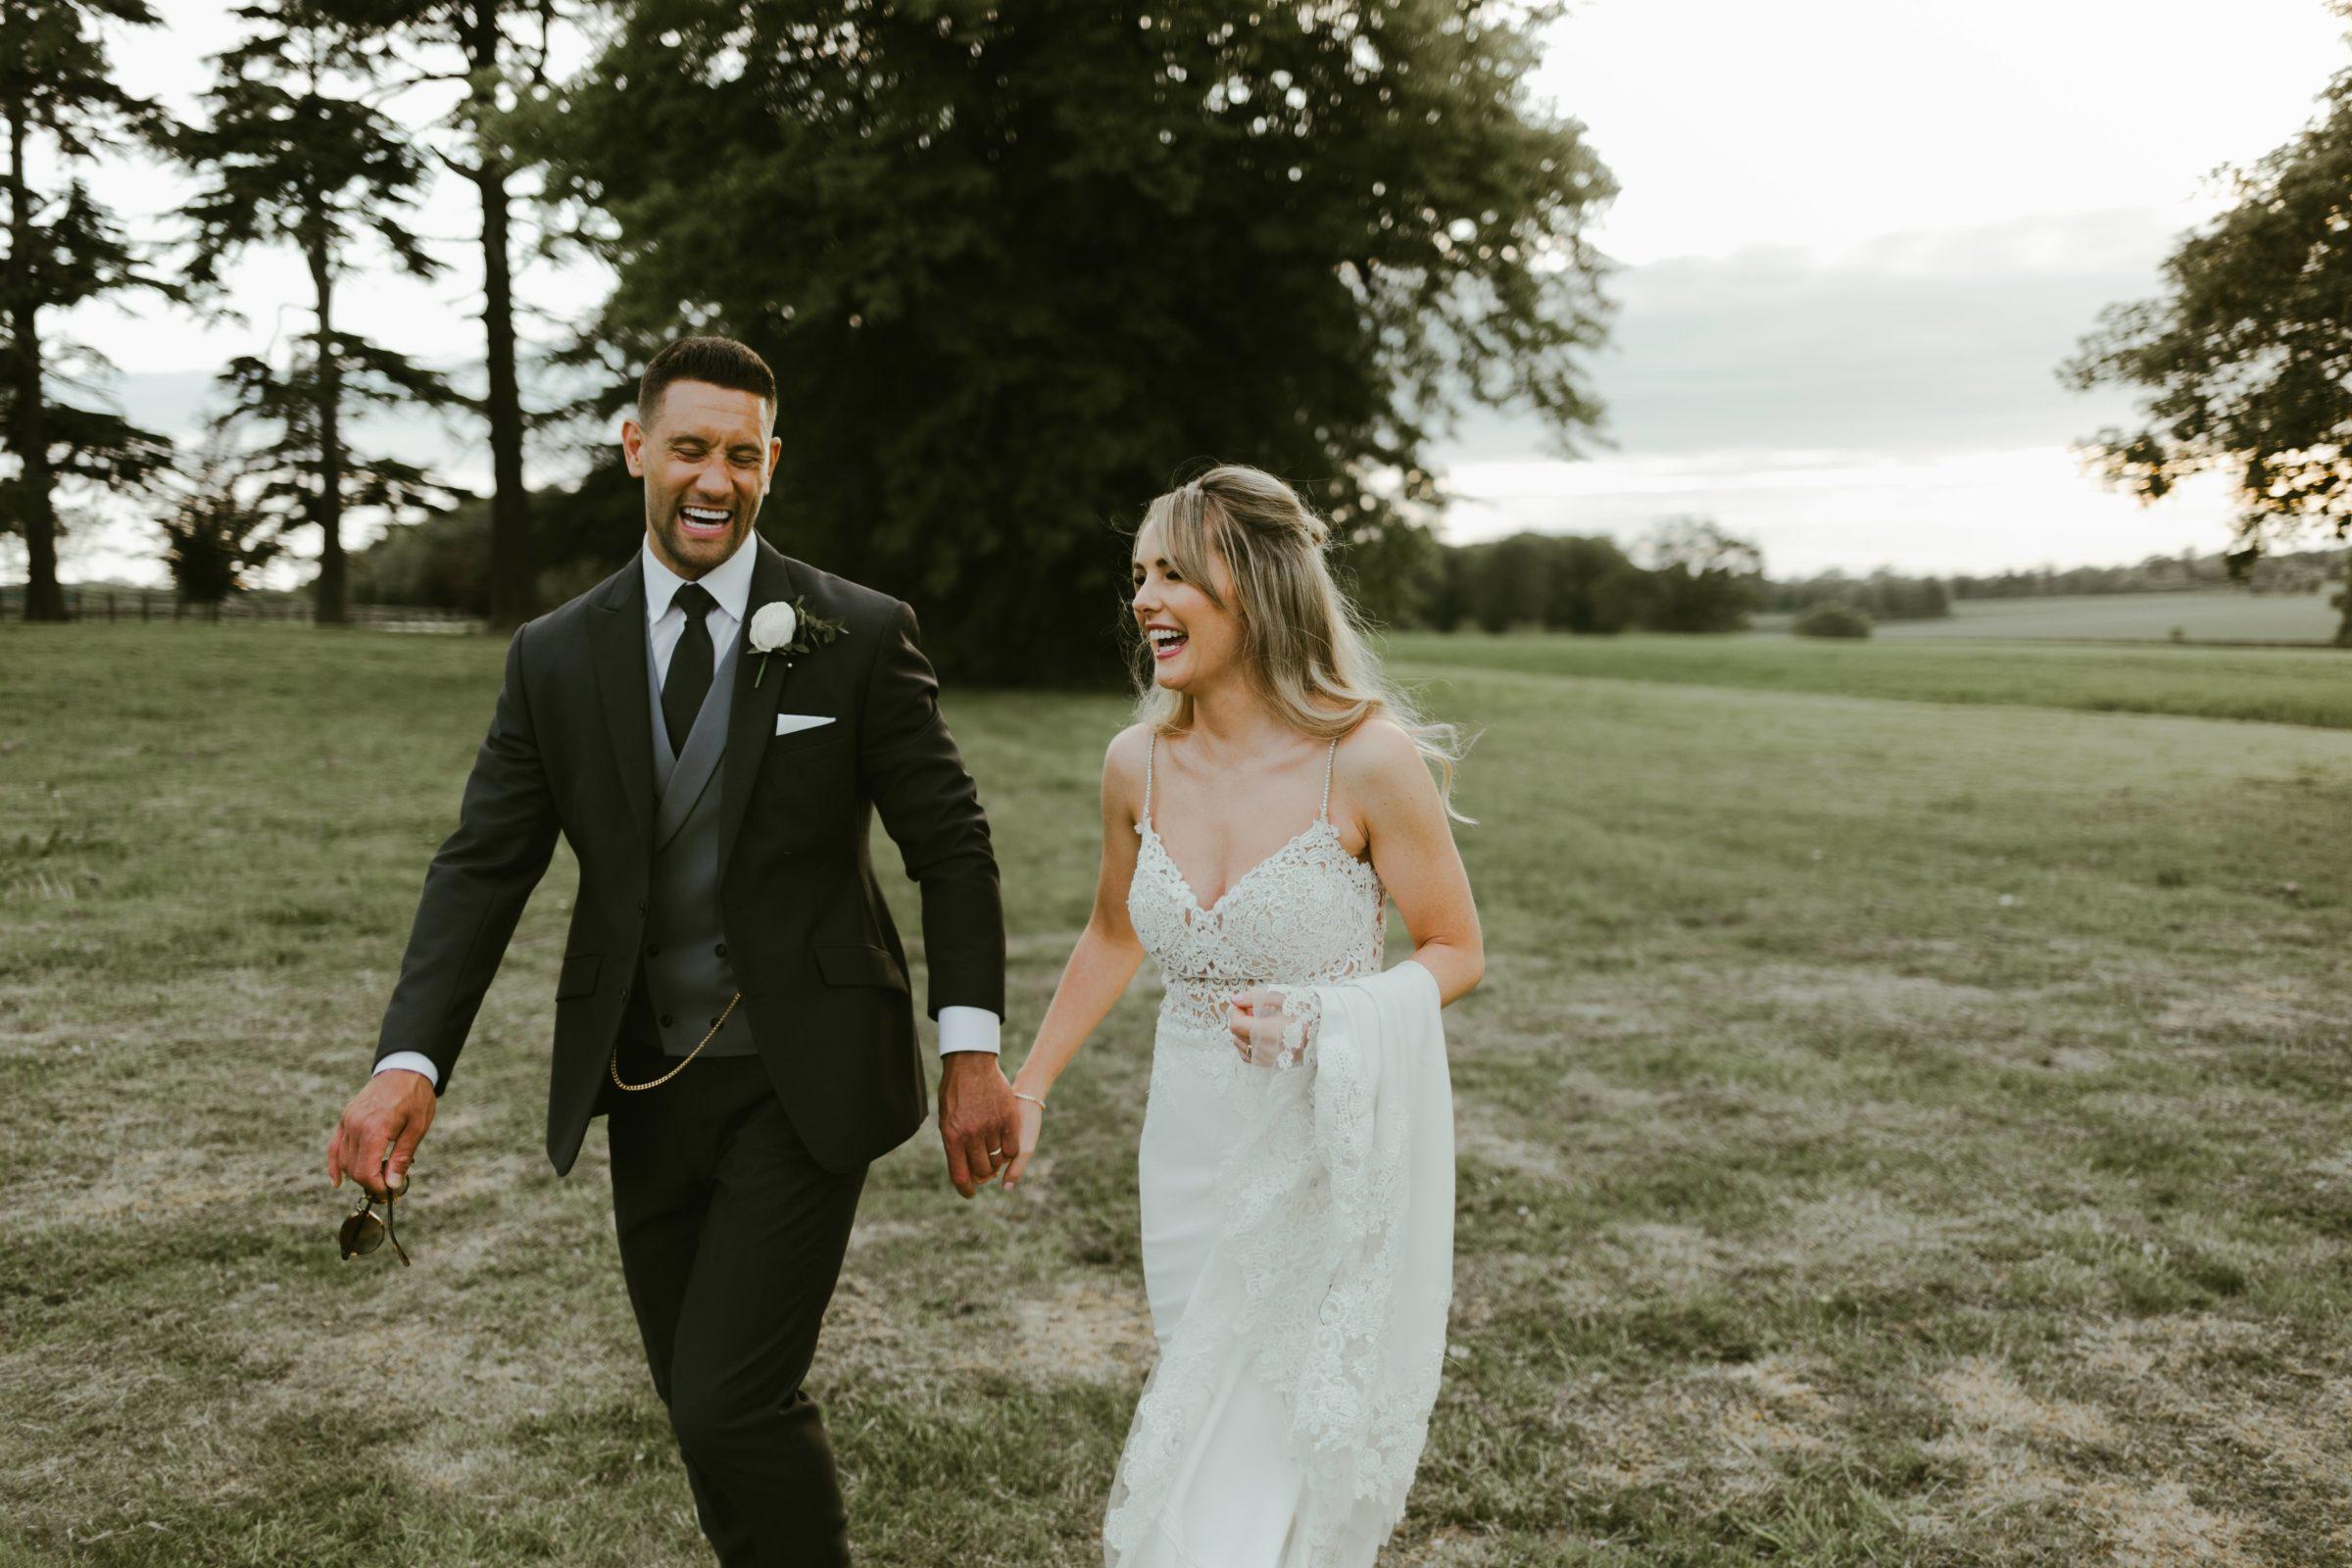 oakley-hall-wedding-venue-couple-surrey-basingstoke-photography-photographer